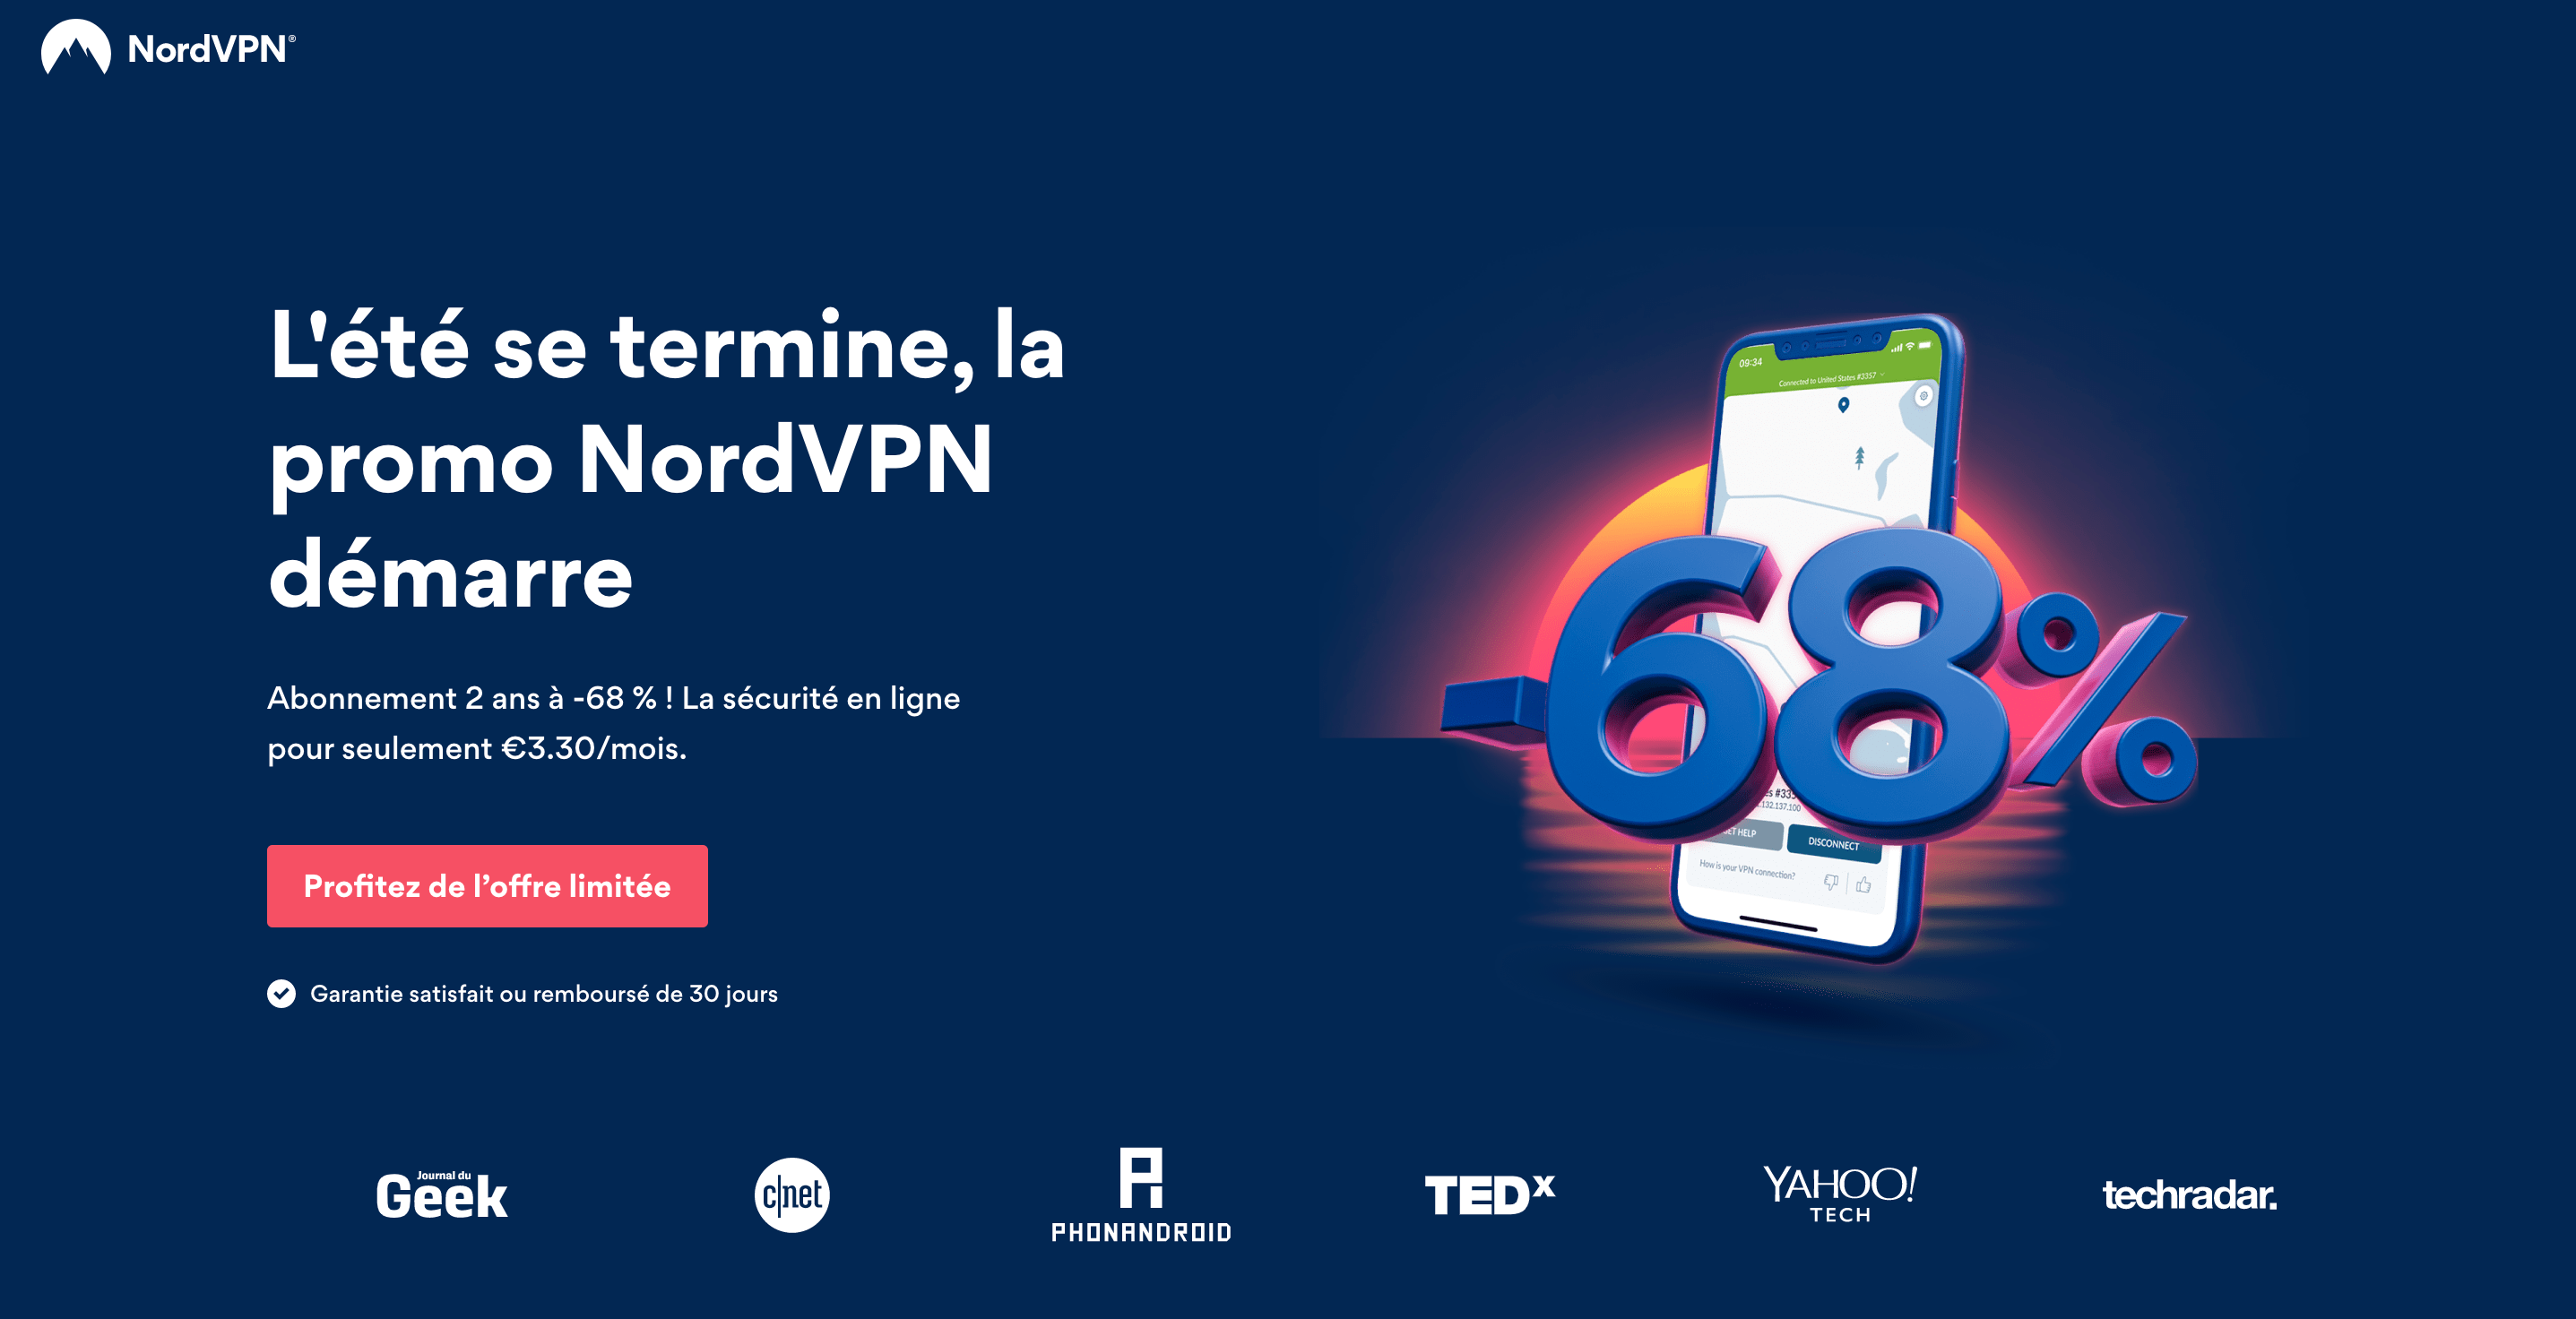 NordVPN en promo à -68% avec le code notabenedeal